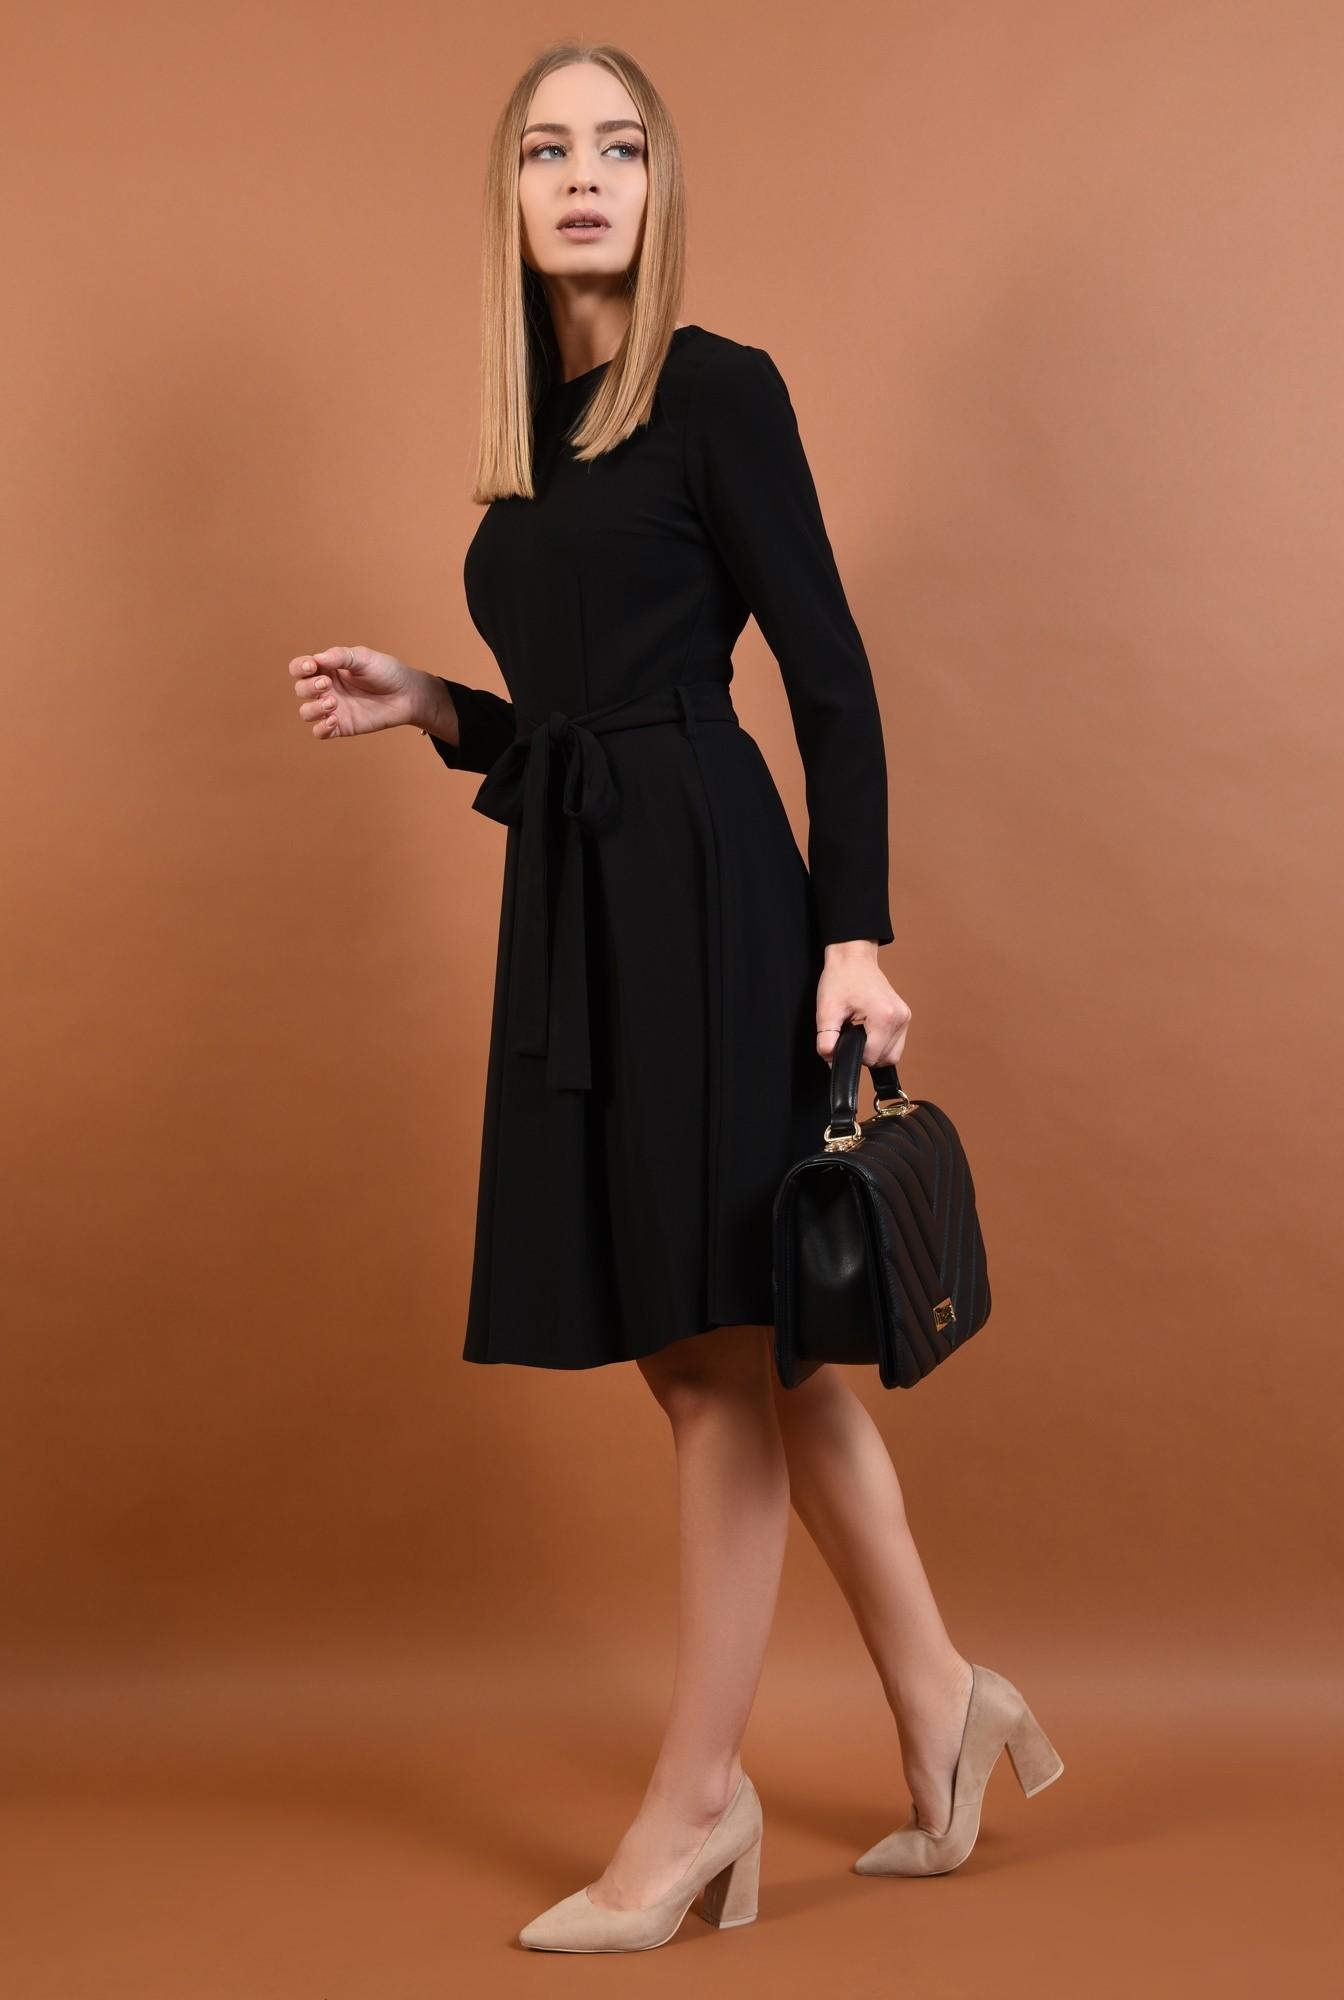 360 - rochie casual evazata, pliseuri late, cordon, funda, negru